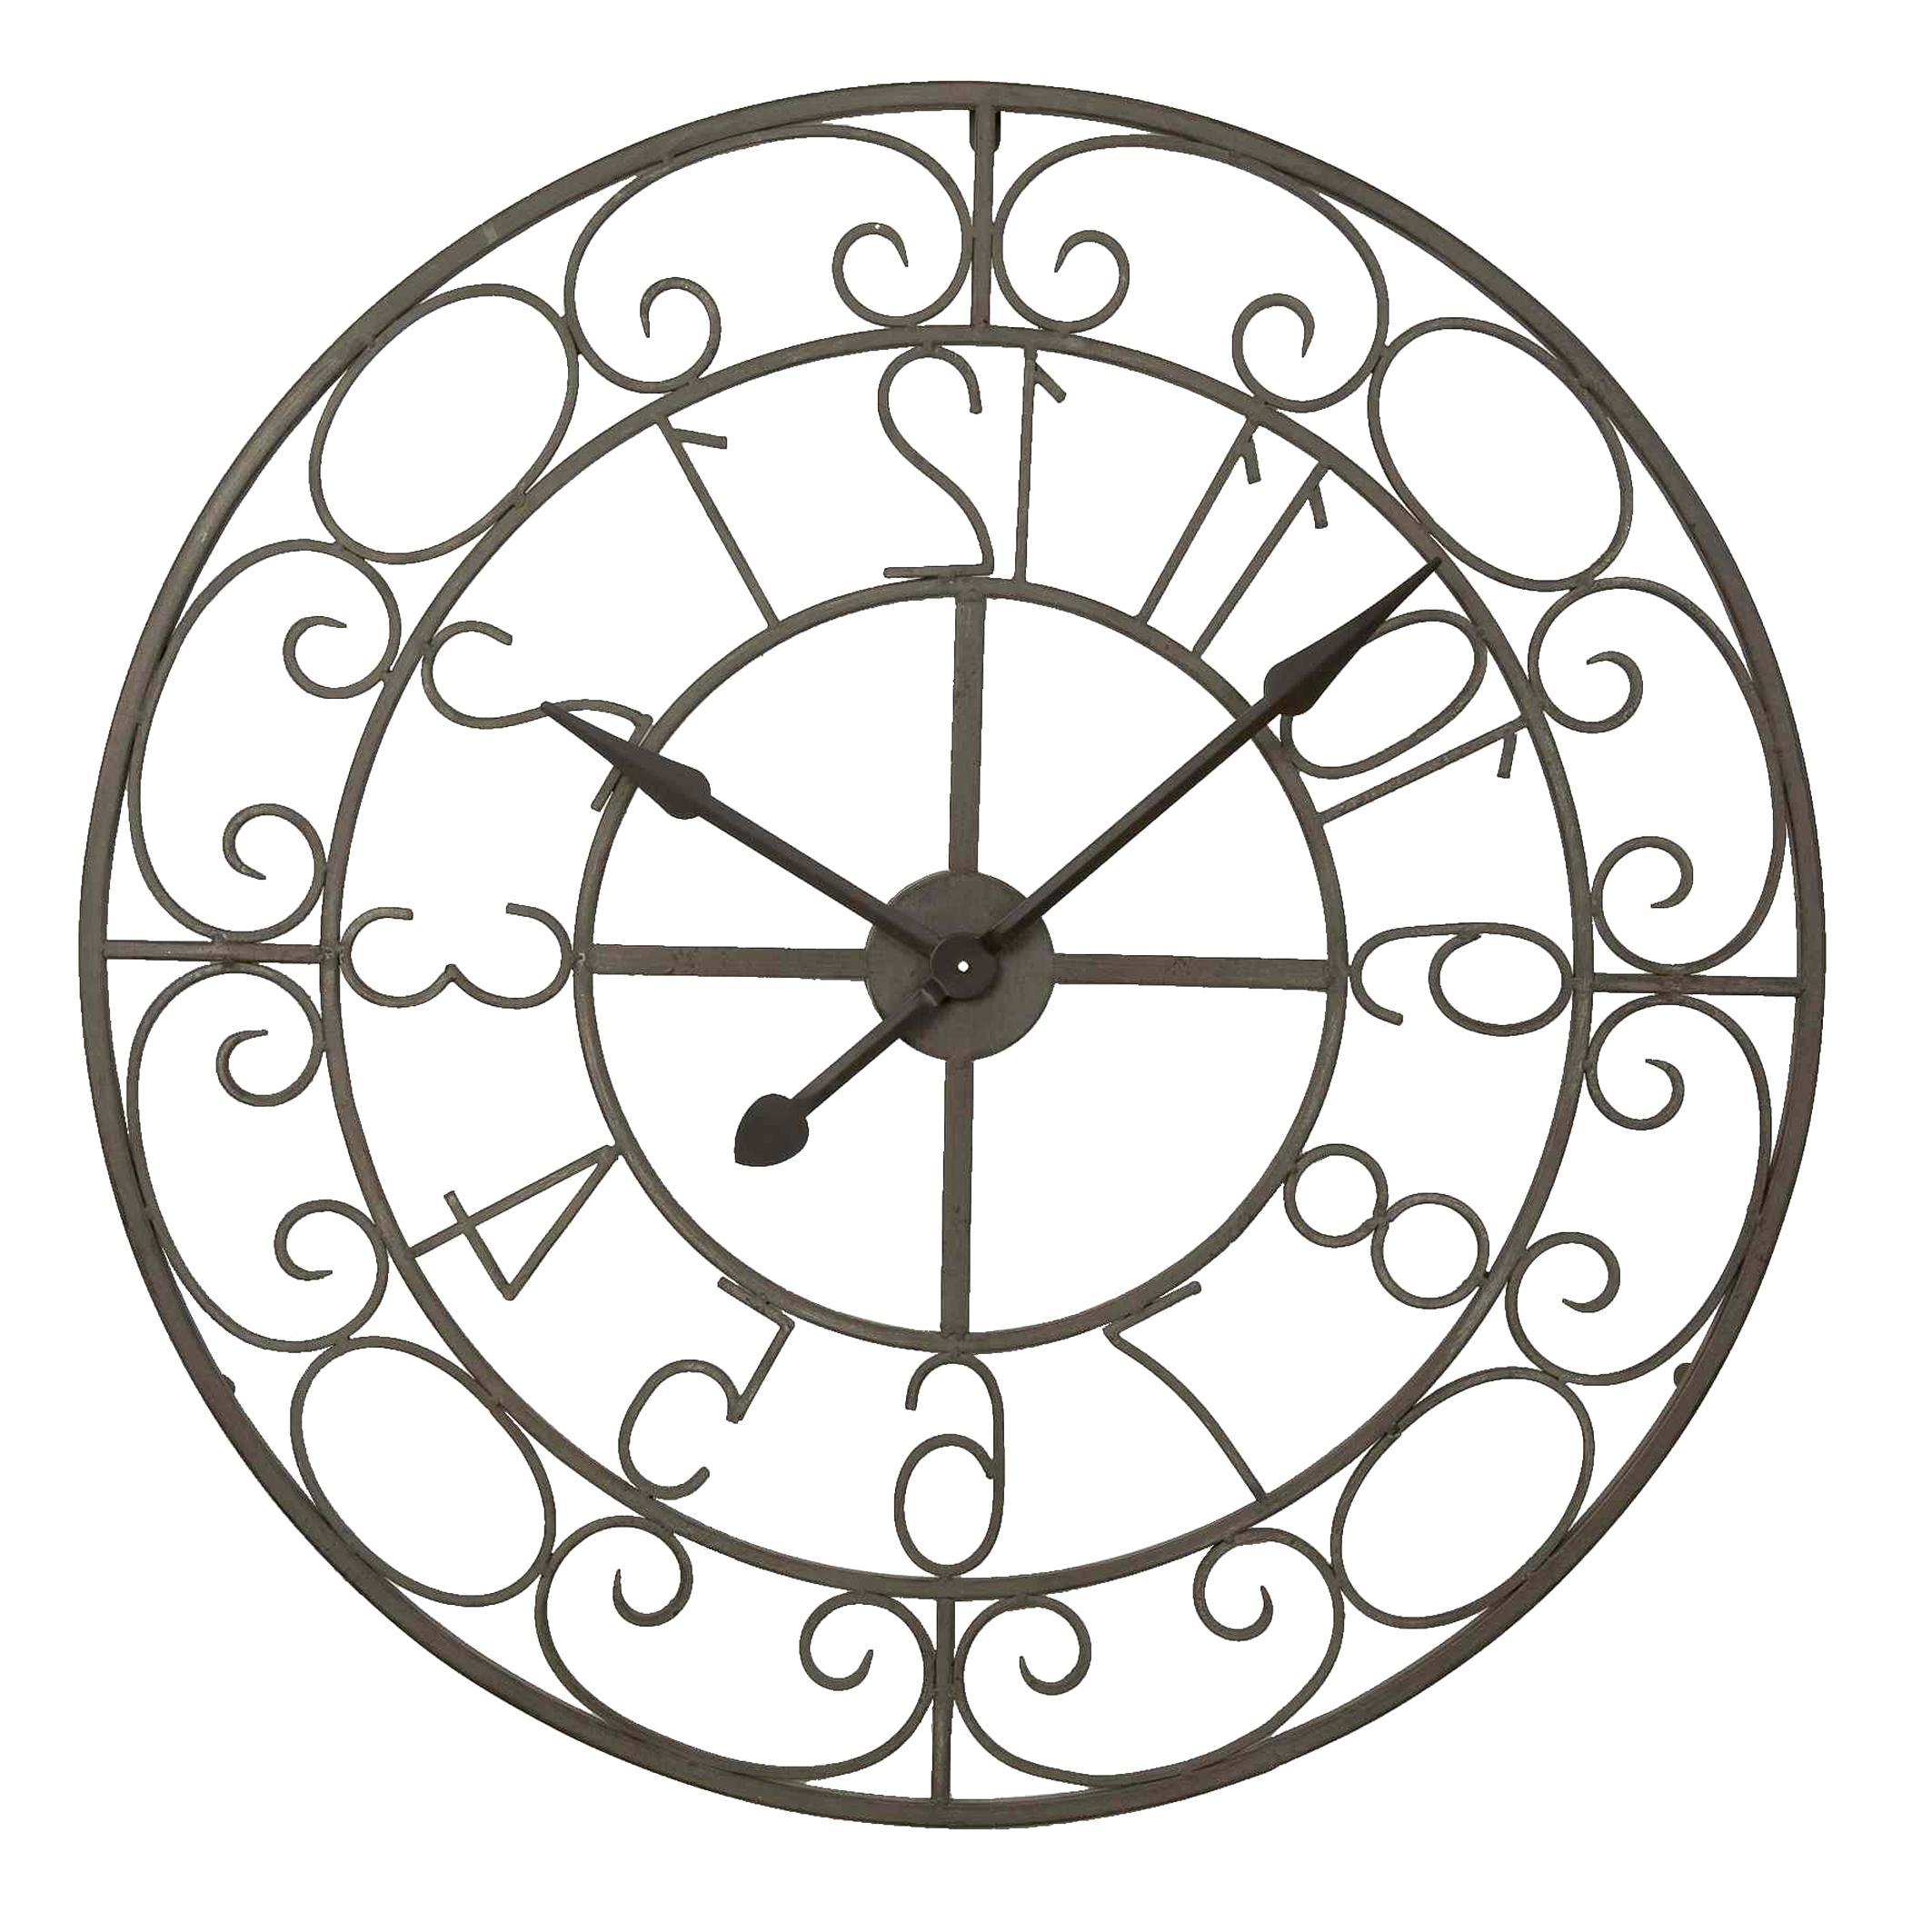 Grosse Horloge Fer Forgé horloge fer forge d'occasion | plus que 3 à -75%